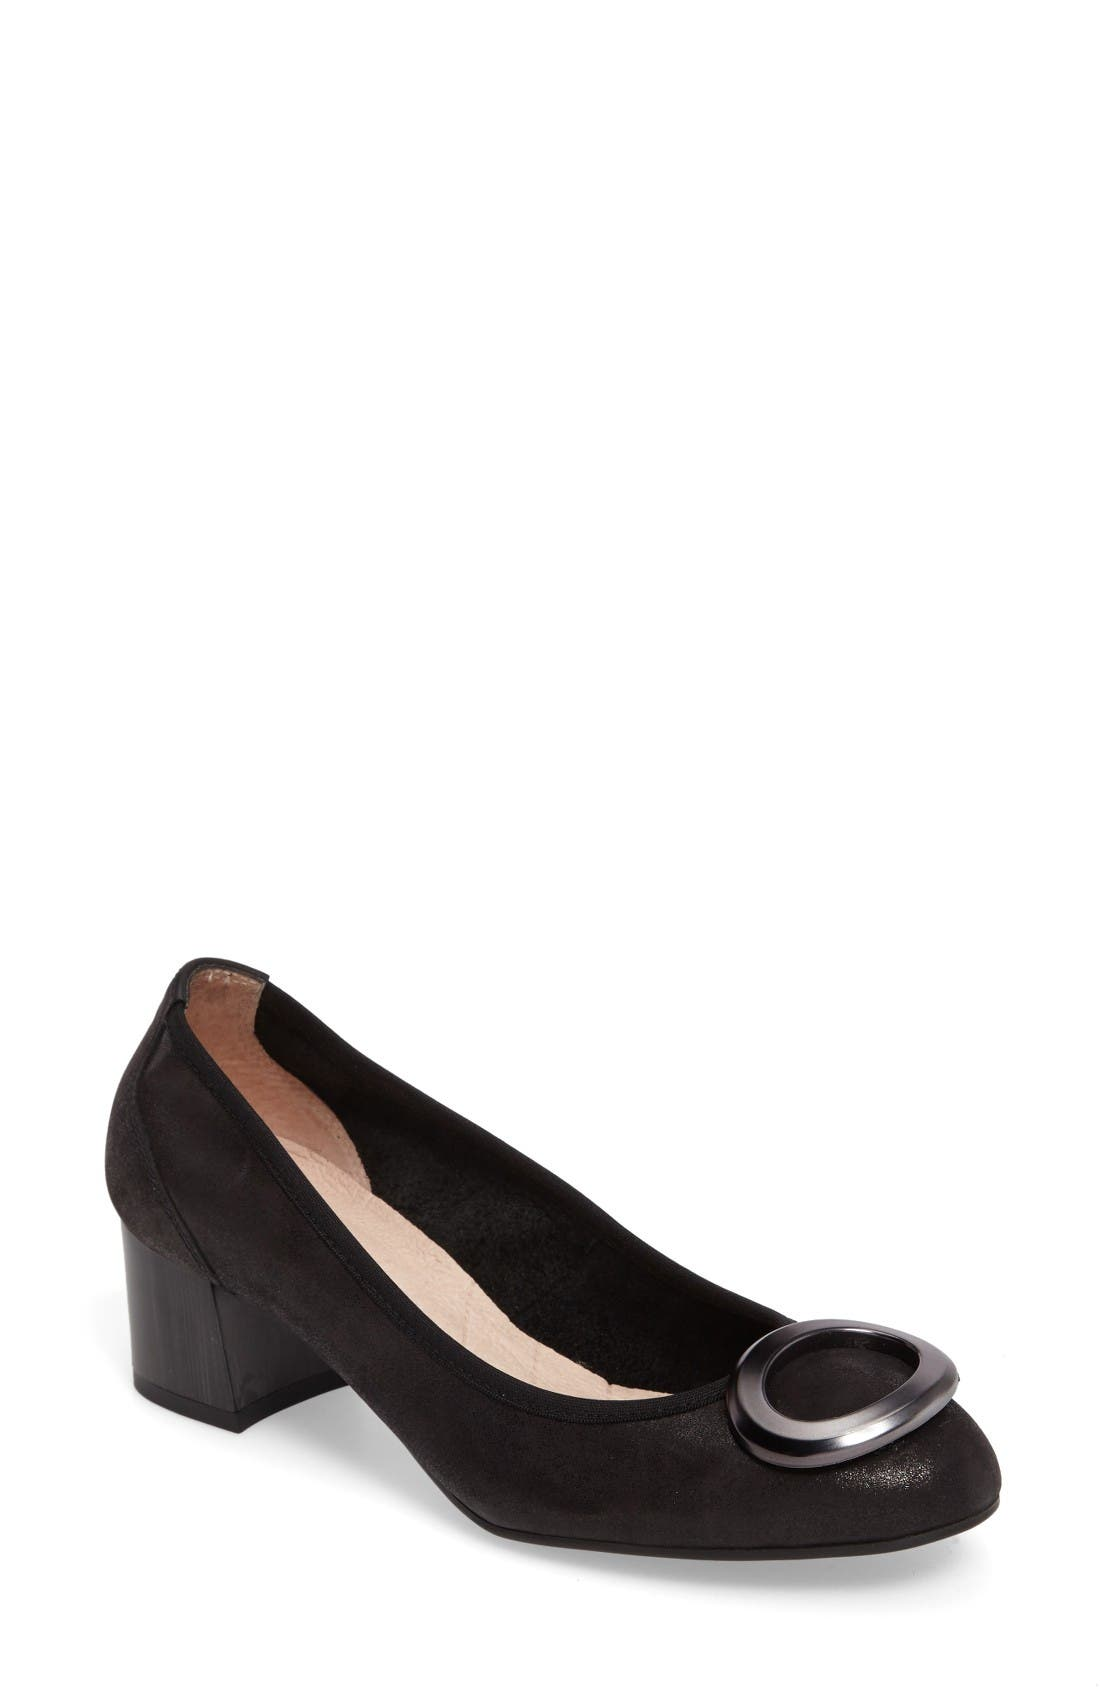 Jayla Brooch Toe Pump,                             Main thumbnail 1, color,                             Magic Black Leather